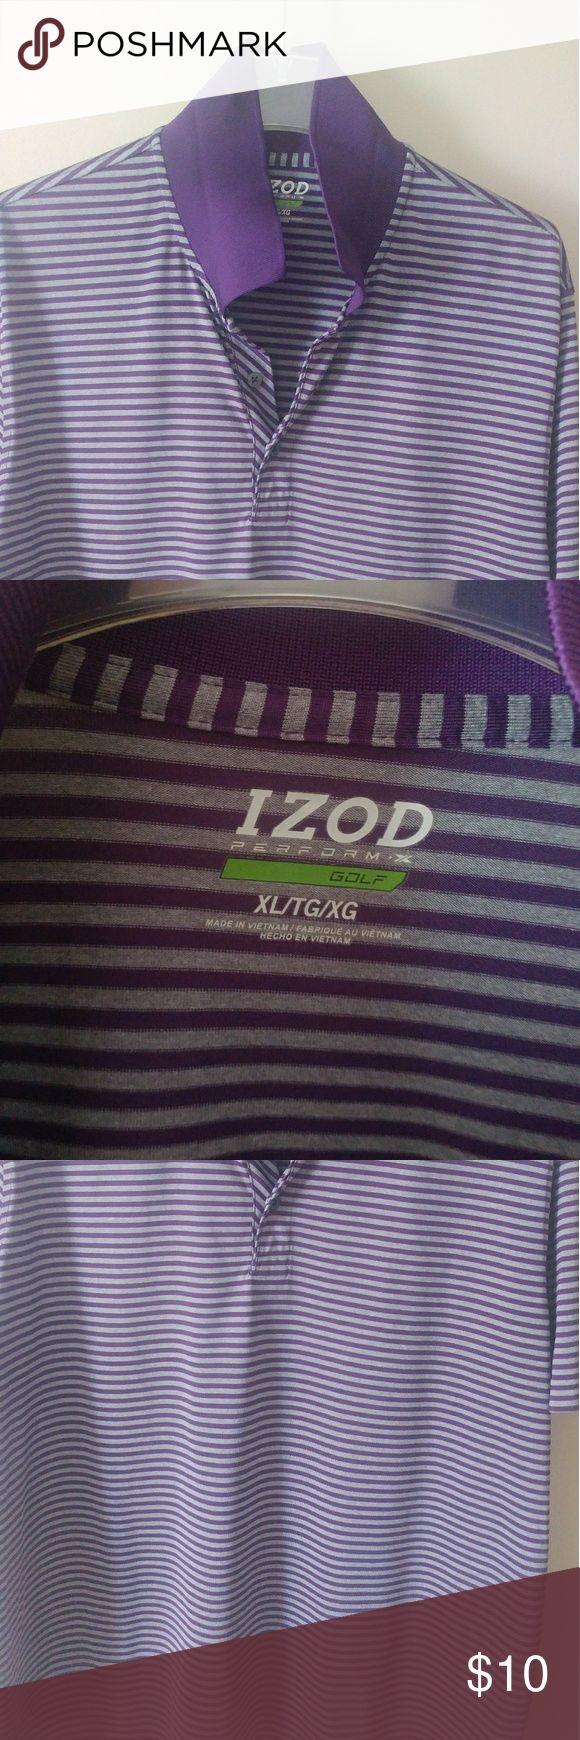 Non-smoking home. Men's Izod Golf Polo XL Men's quick dry Izod golf polo in good shape. Izod Shirts Polos